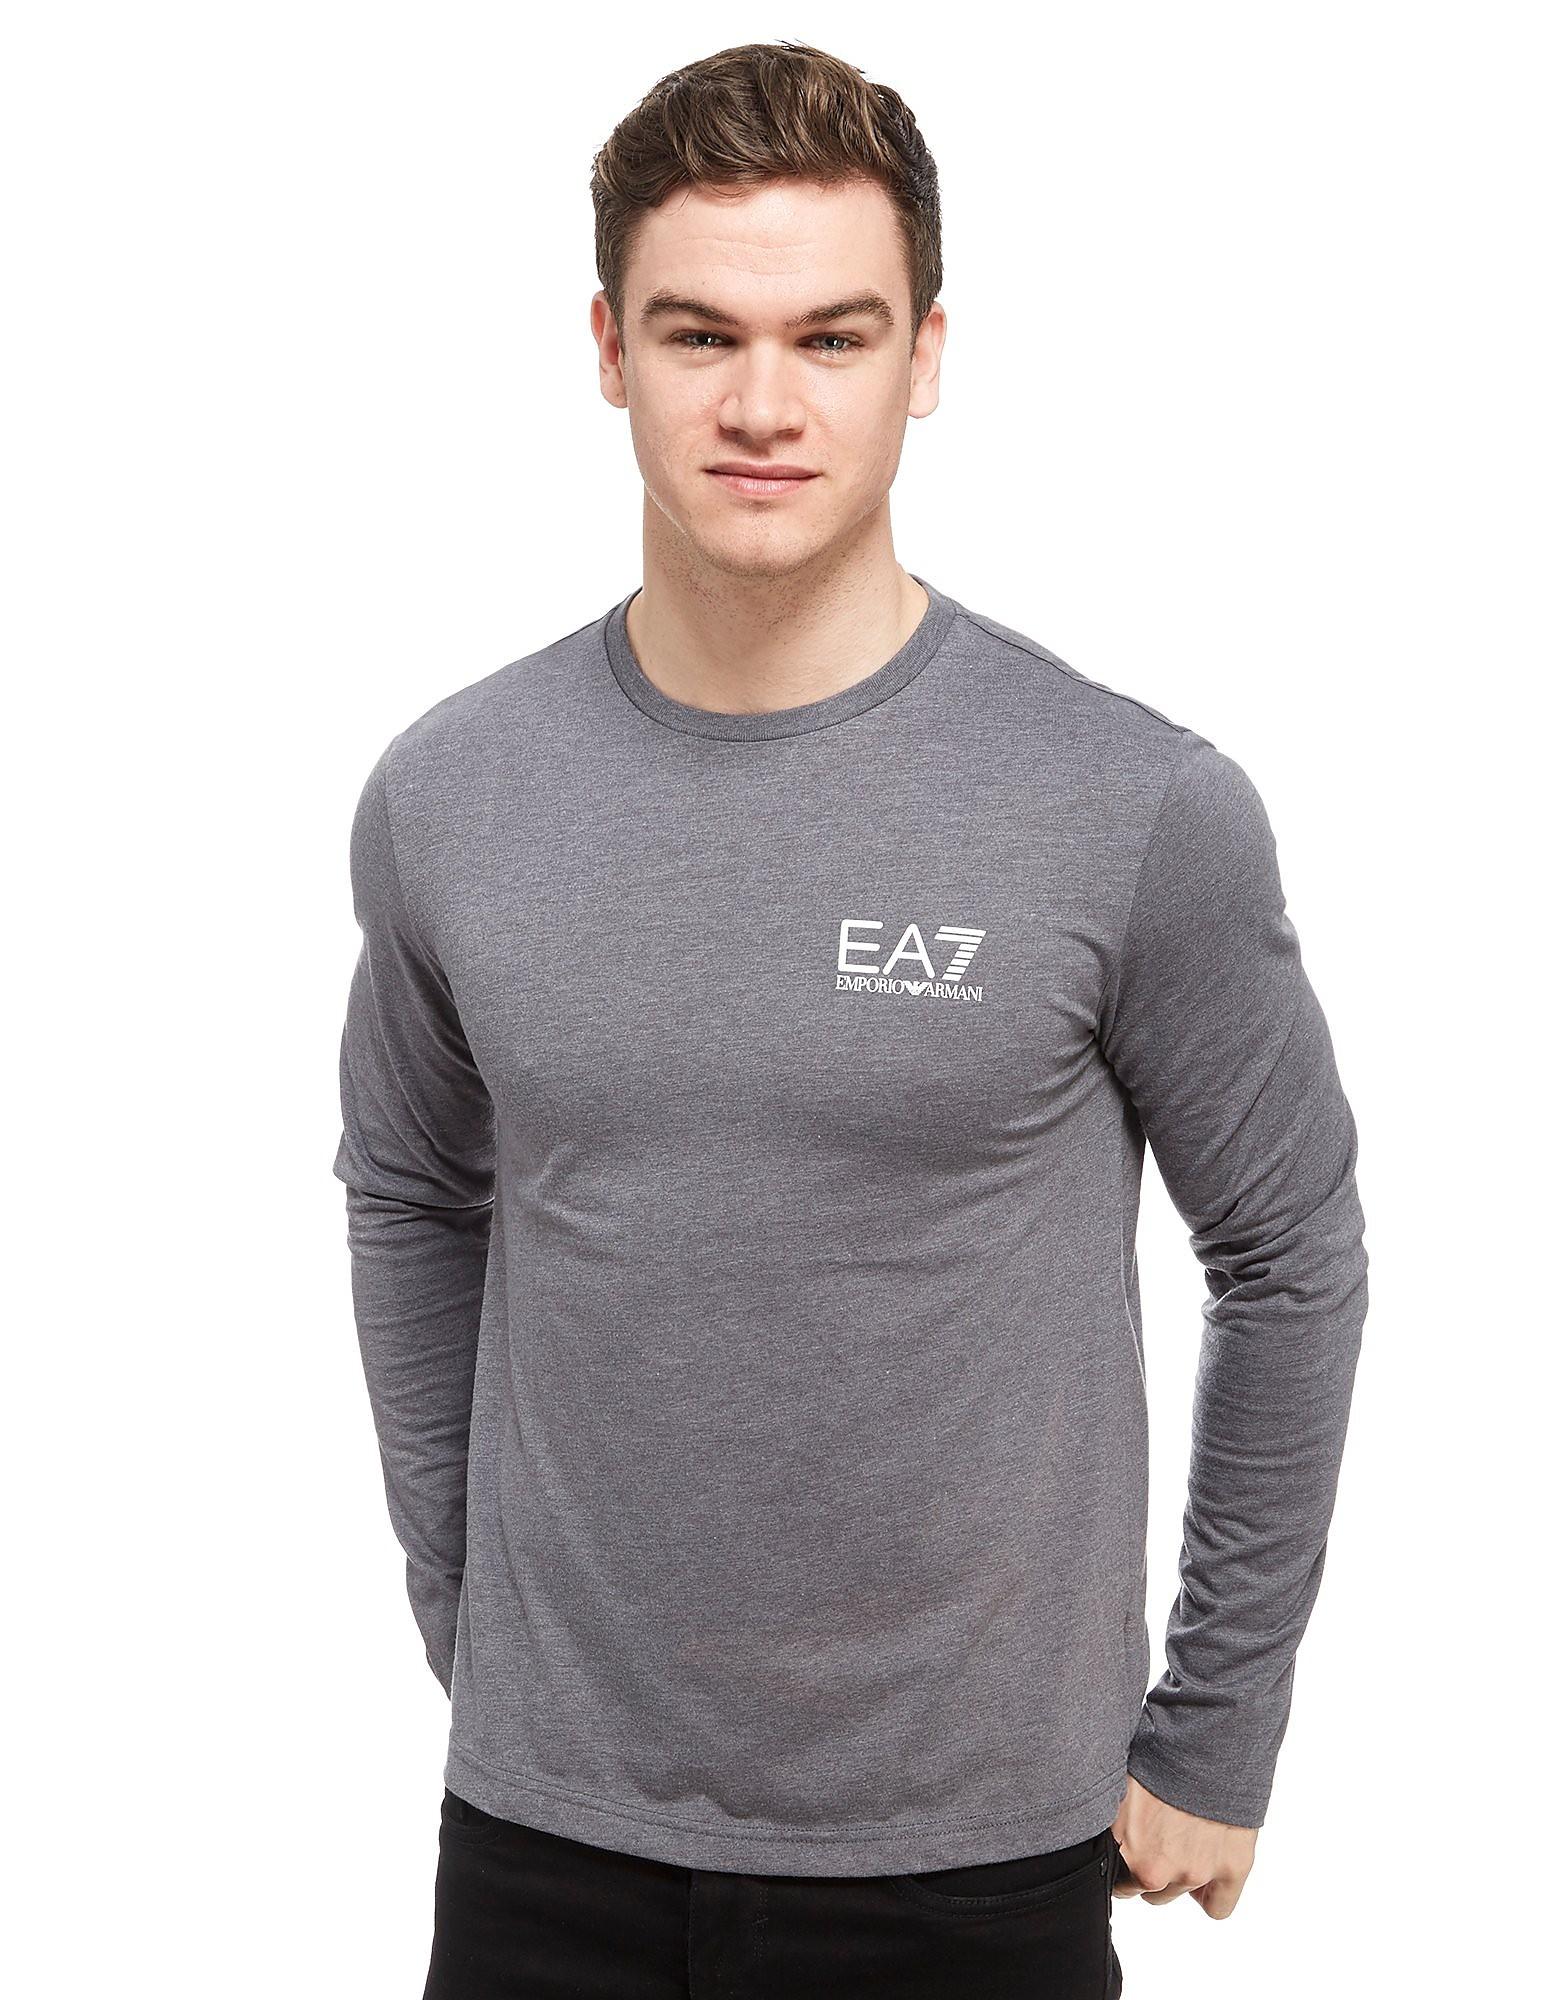 Emporio Armani EA7 camiseta de manga larga Core